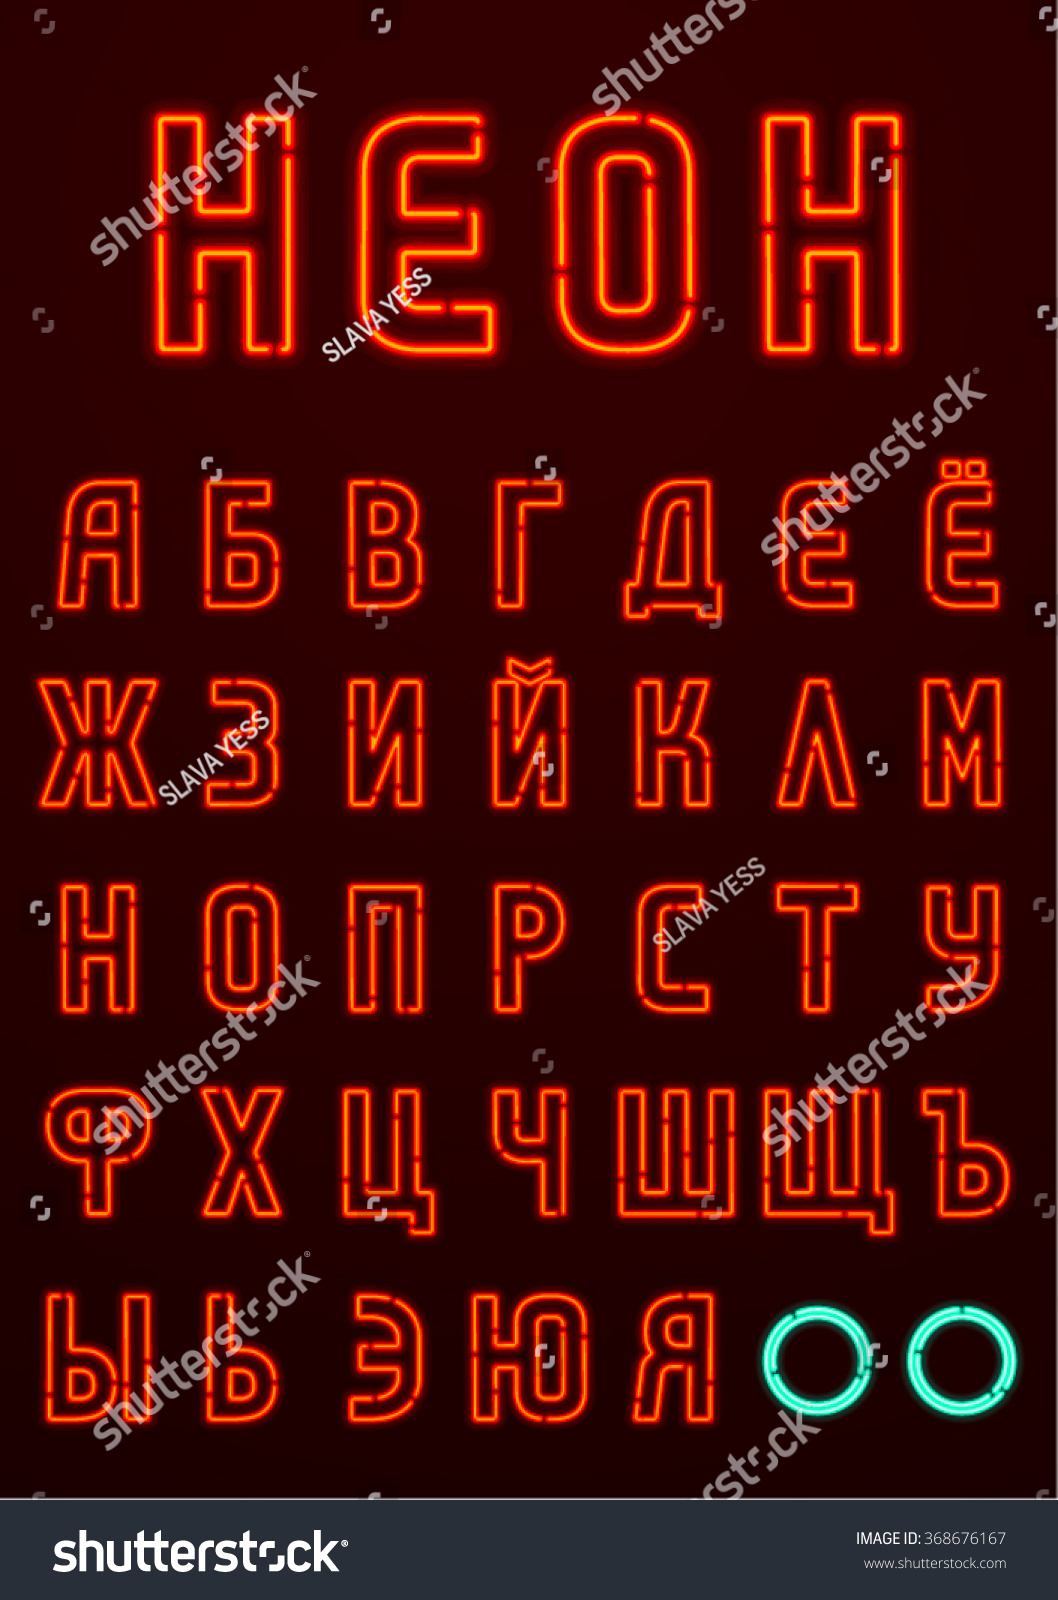 Neon font complete alphabet numbers symbols stock vector - Alphabet complet ...